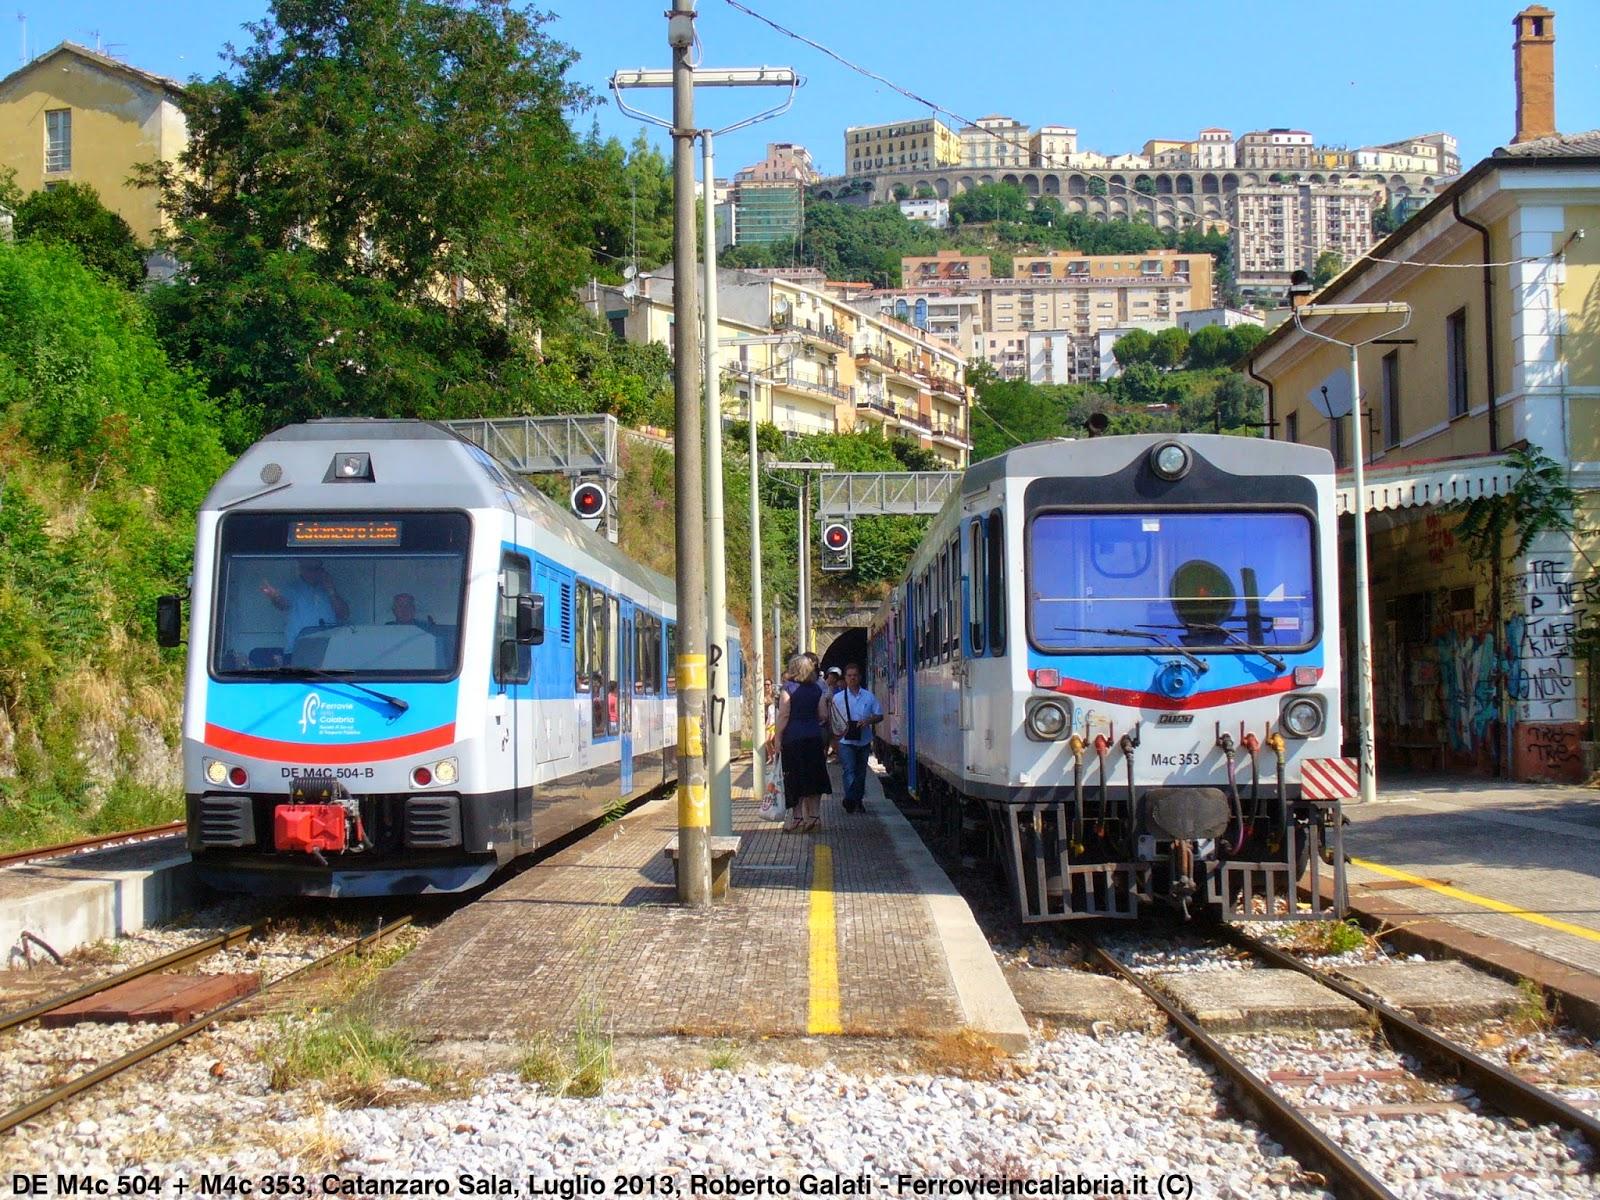 FC-M4c 353-DE M4c 504-CatanzaroSala-2013-06-20-RobertoGalati